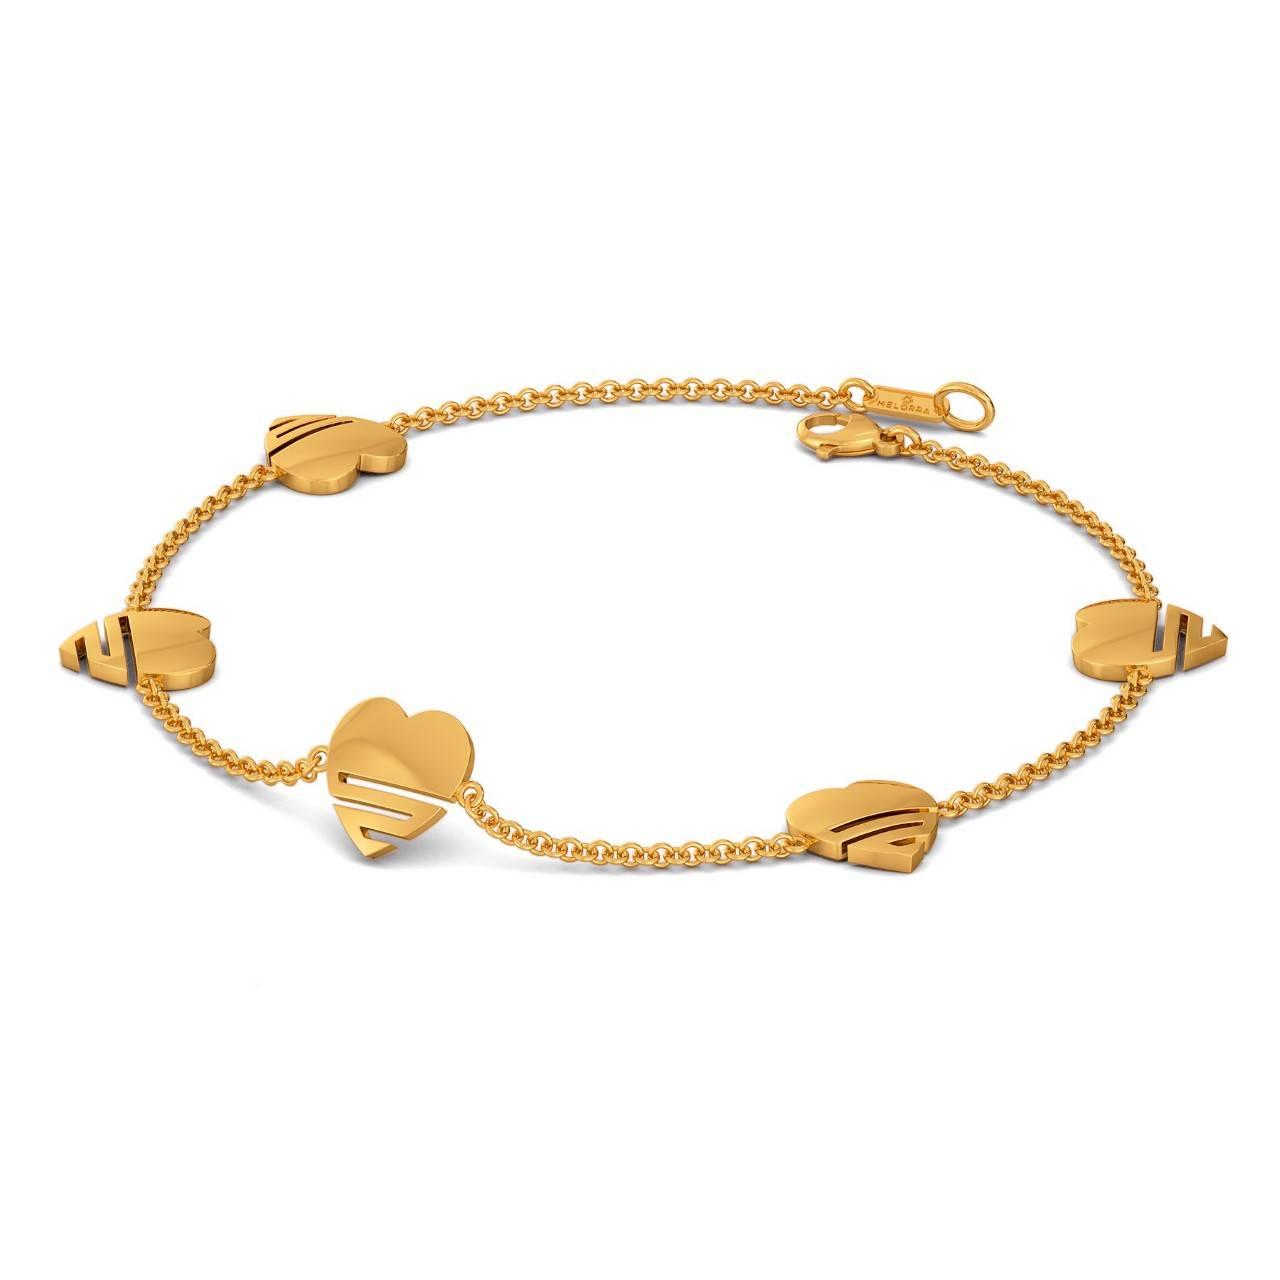 Melorra Jewellery